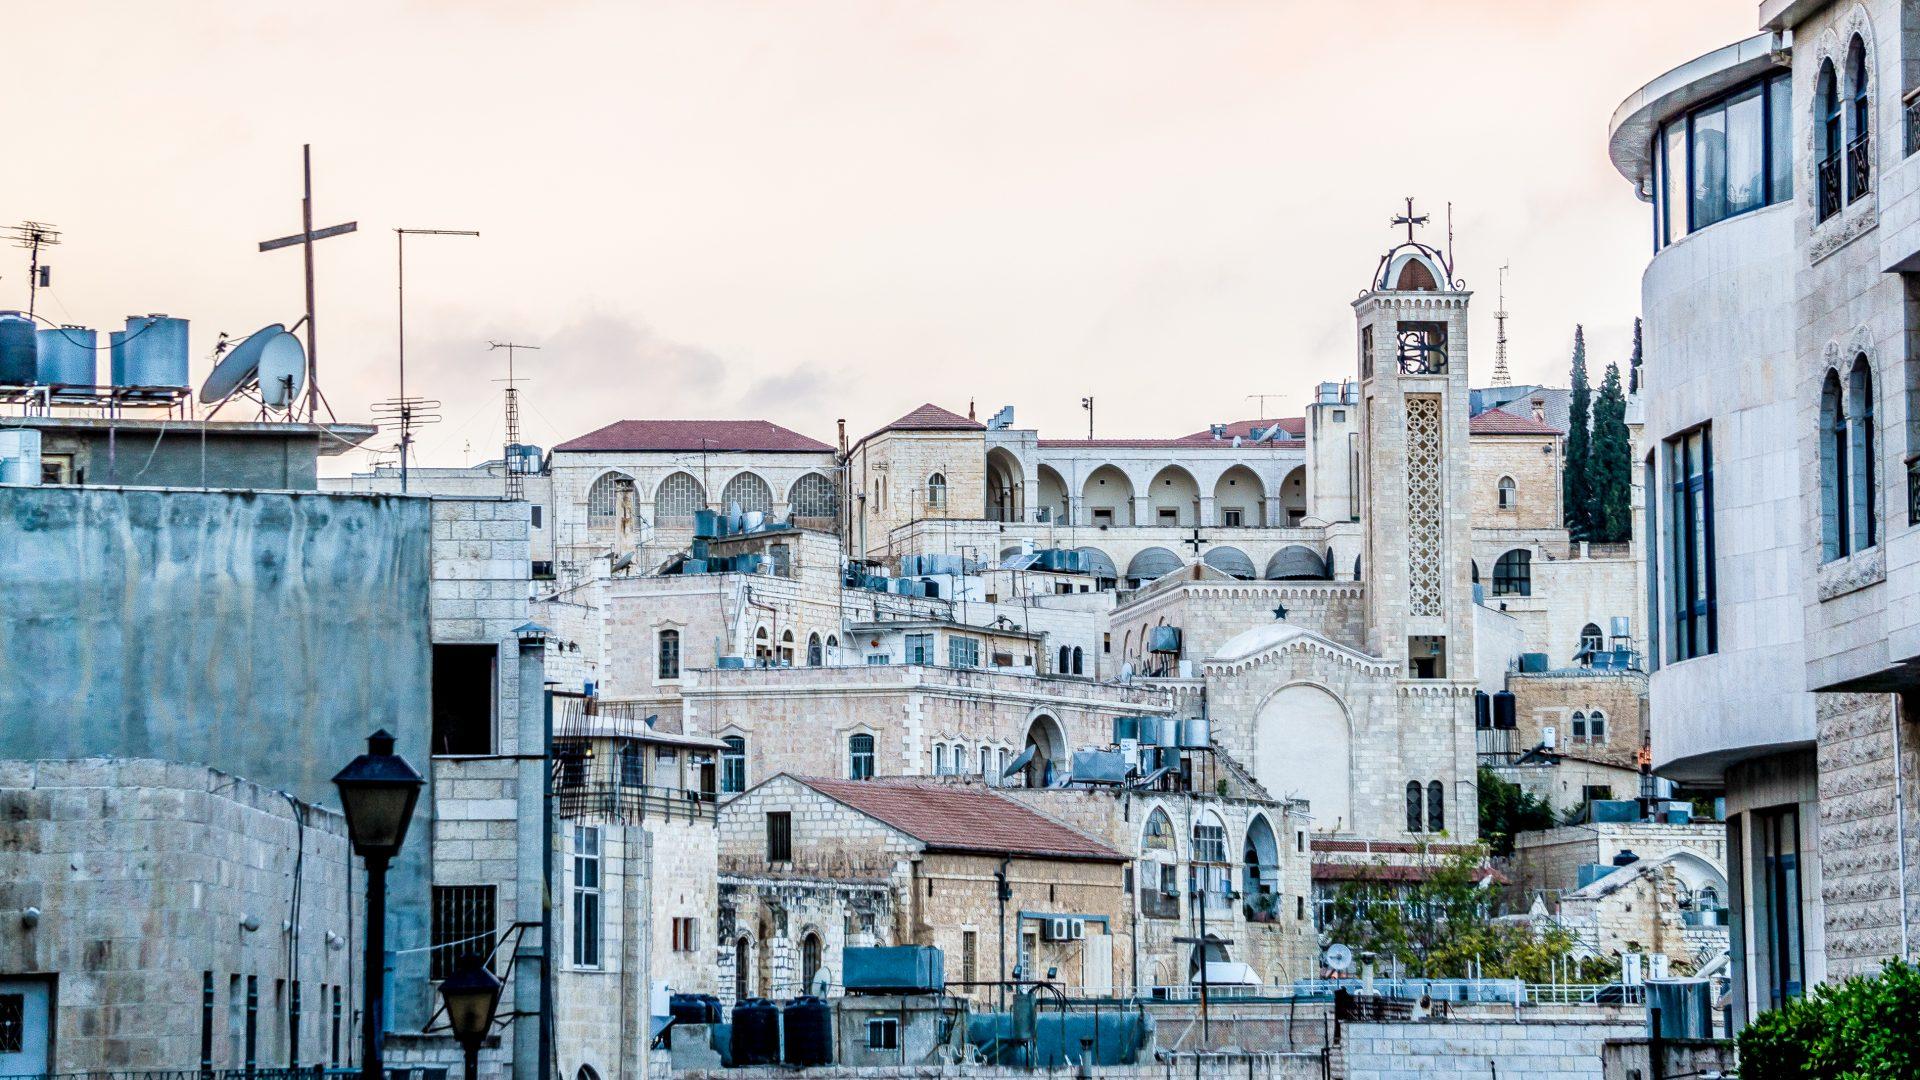 The city of Bethlehem, Palestine, at dusk.